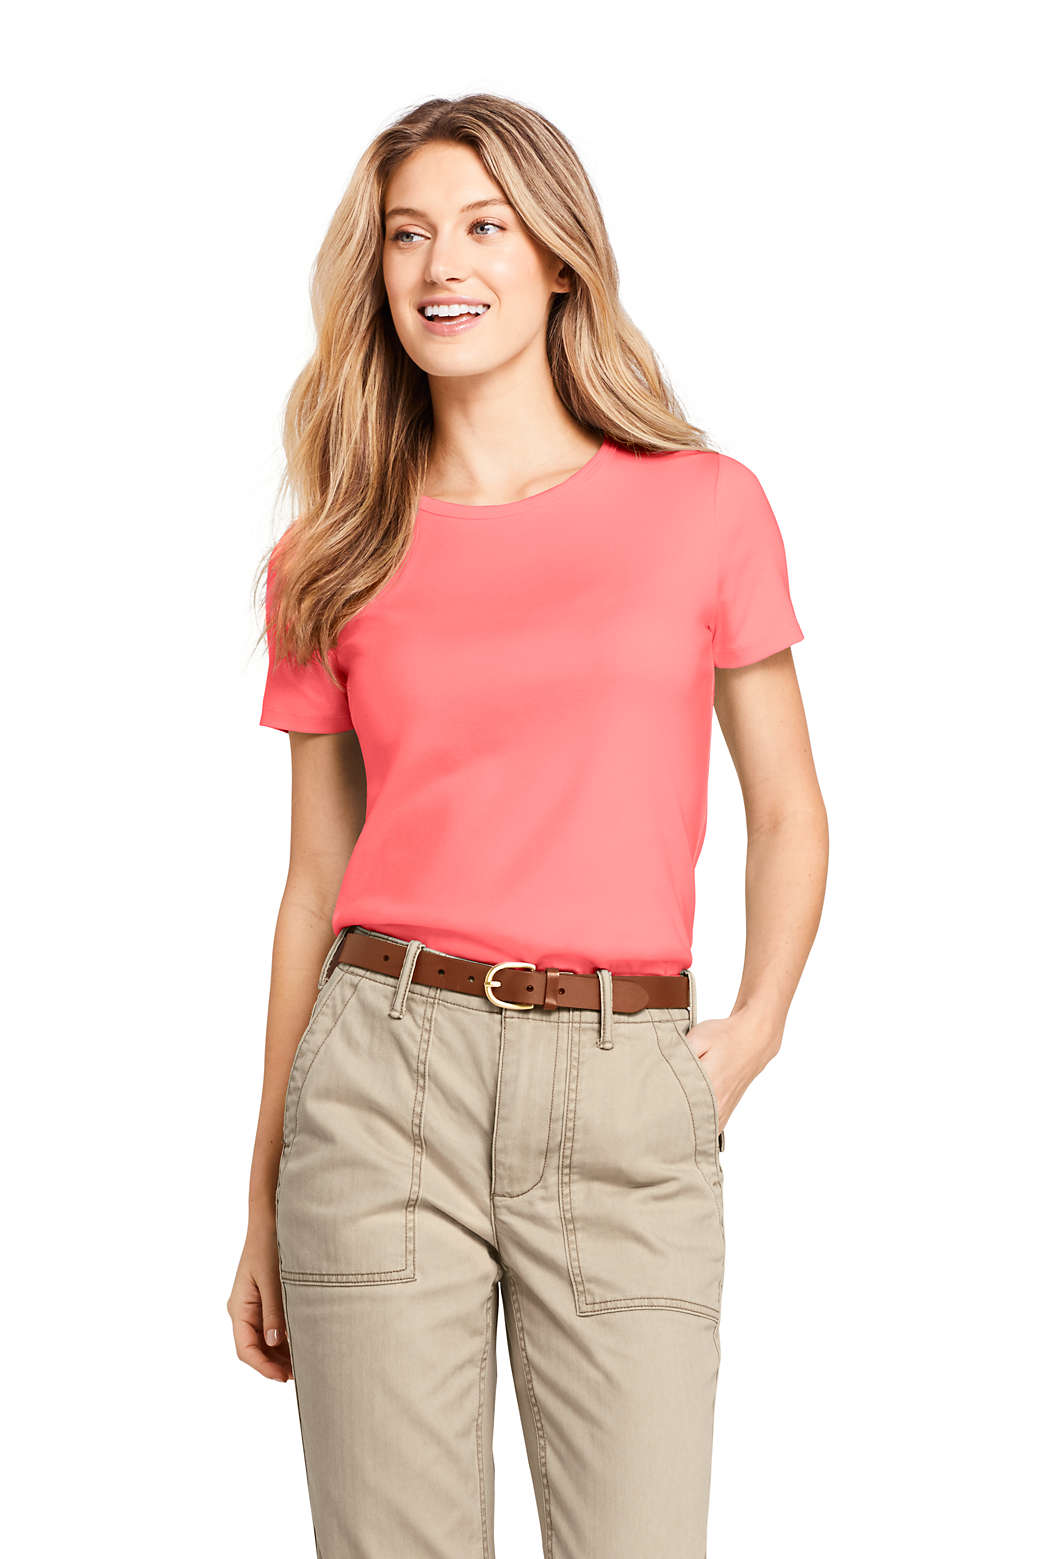 d6ba0a1c4 Women s Shaped Cotton Crewneck T-shirt from Lands  End